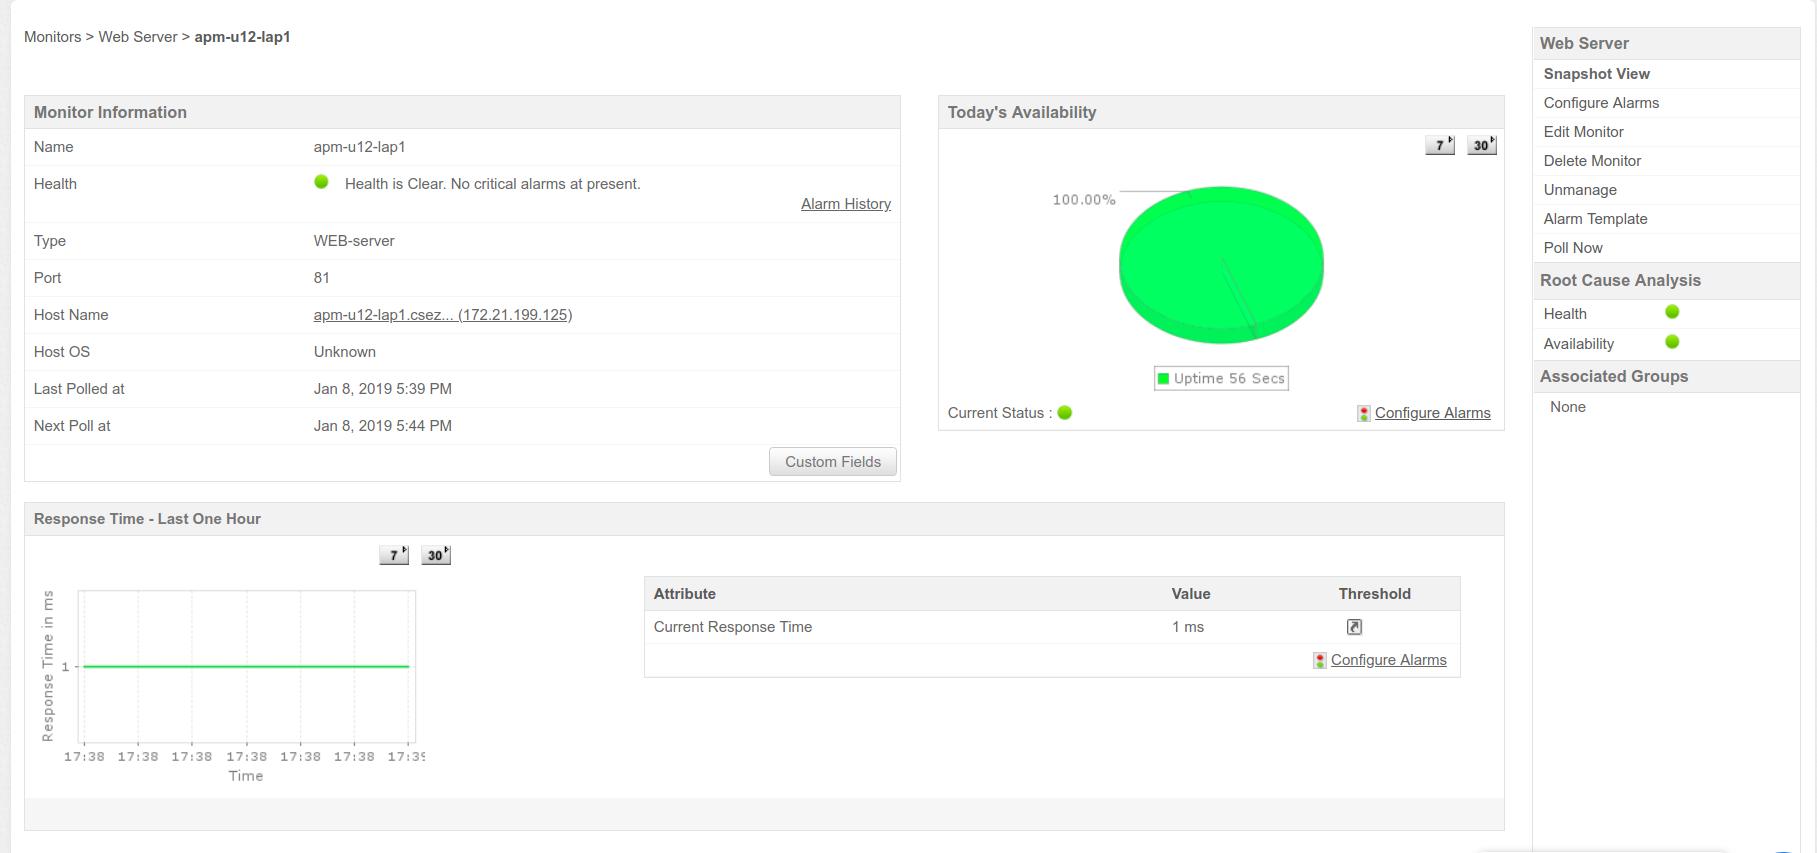 Monitor Web Server Information